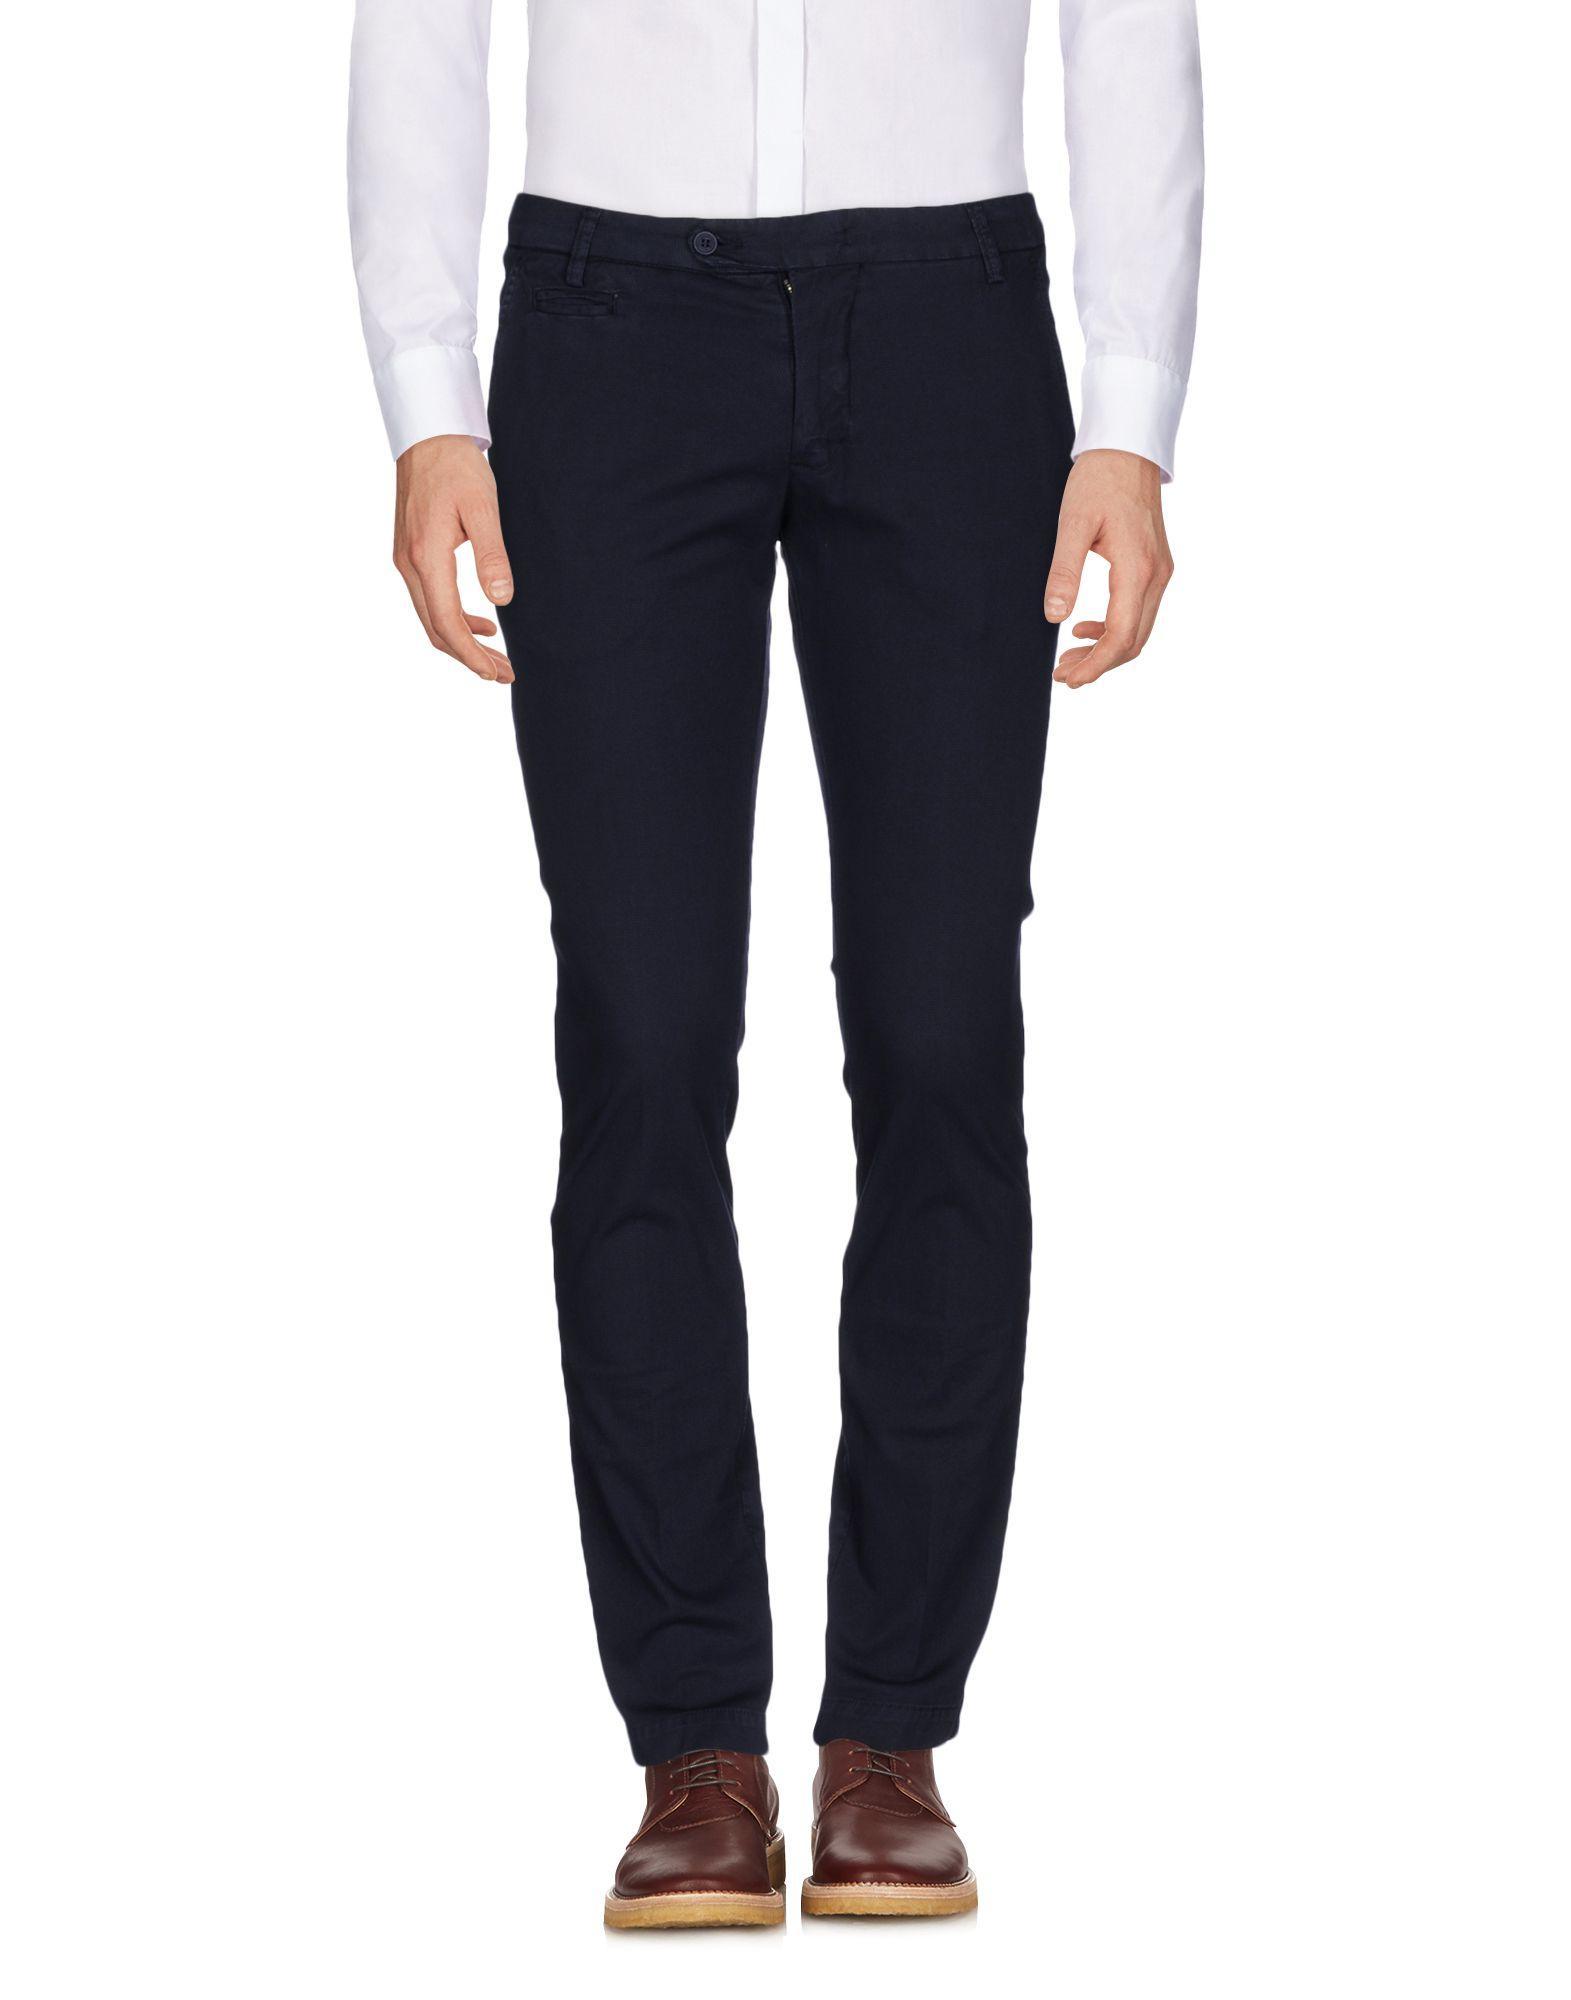 e51dbe9f1 https   www.lyst.com clothing burlington-preston-argyle-greenstone ...